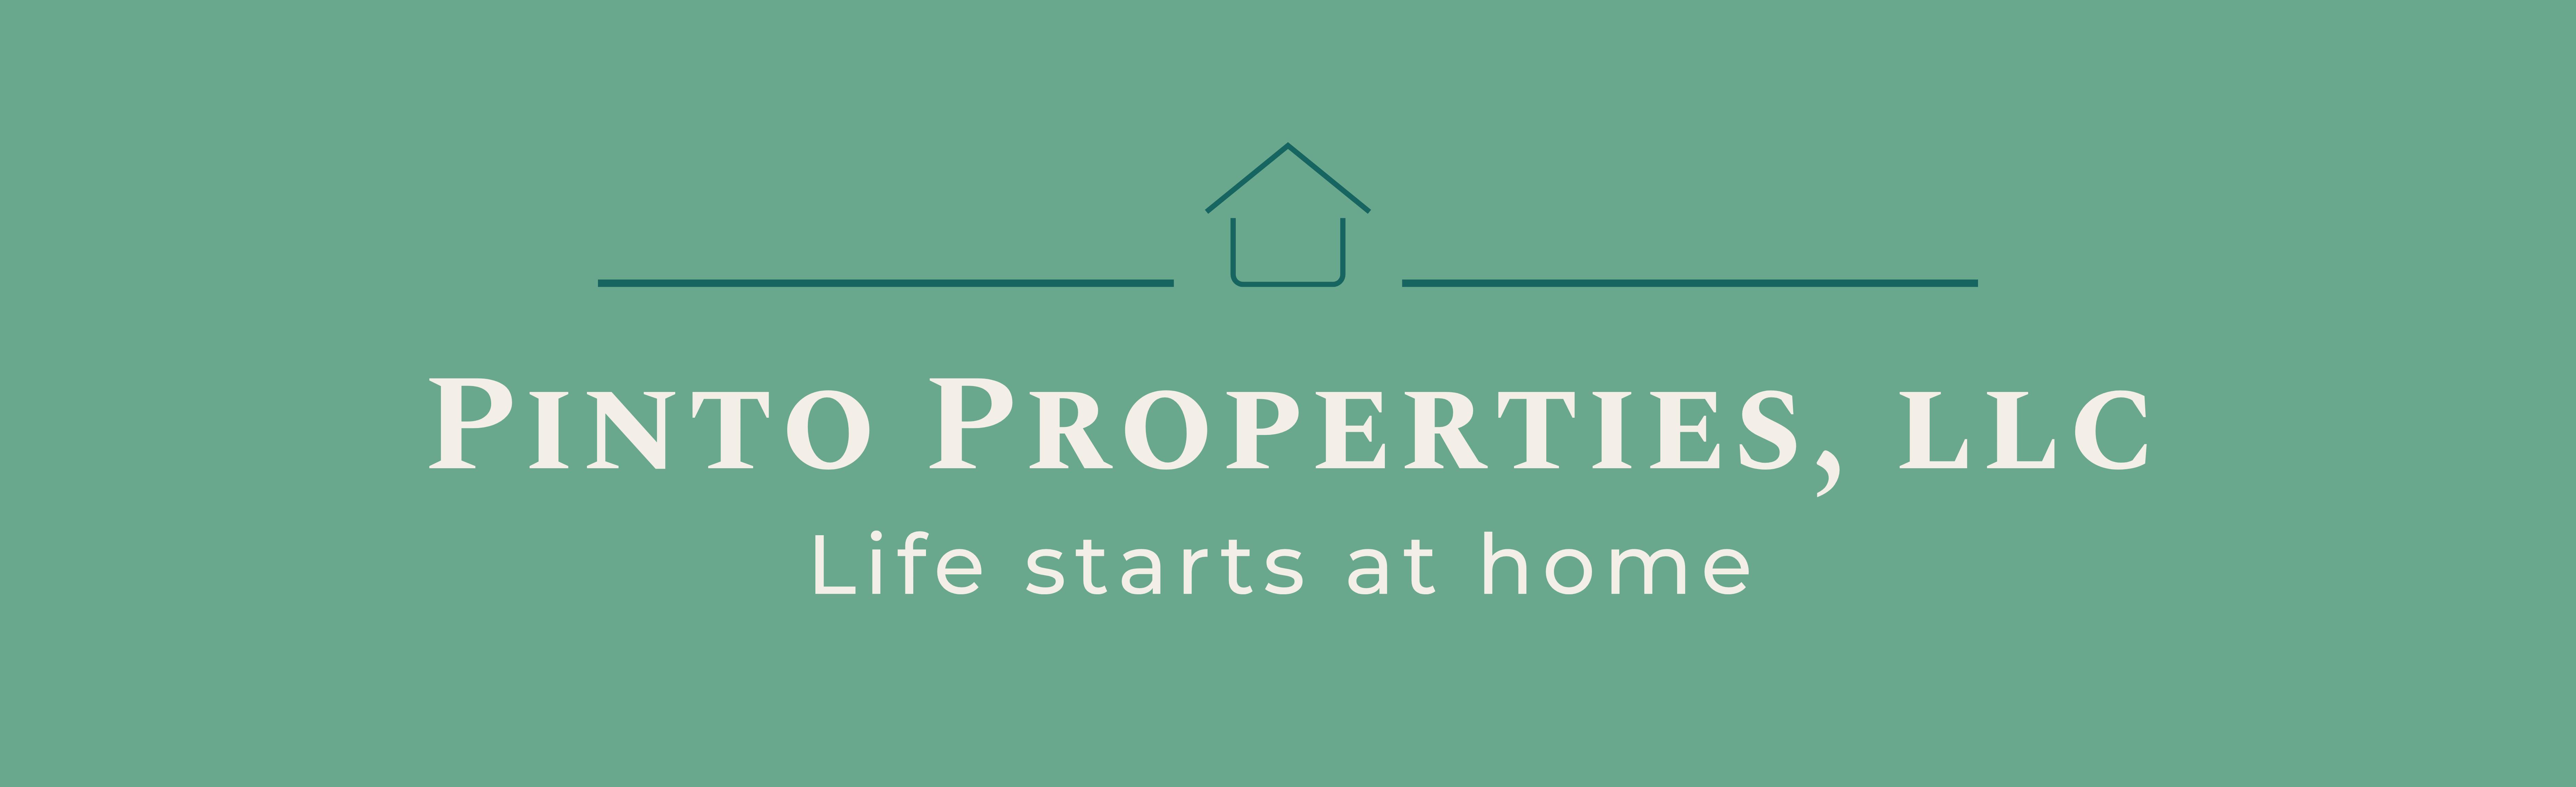 Pinto Properties, LLC